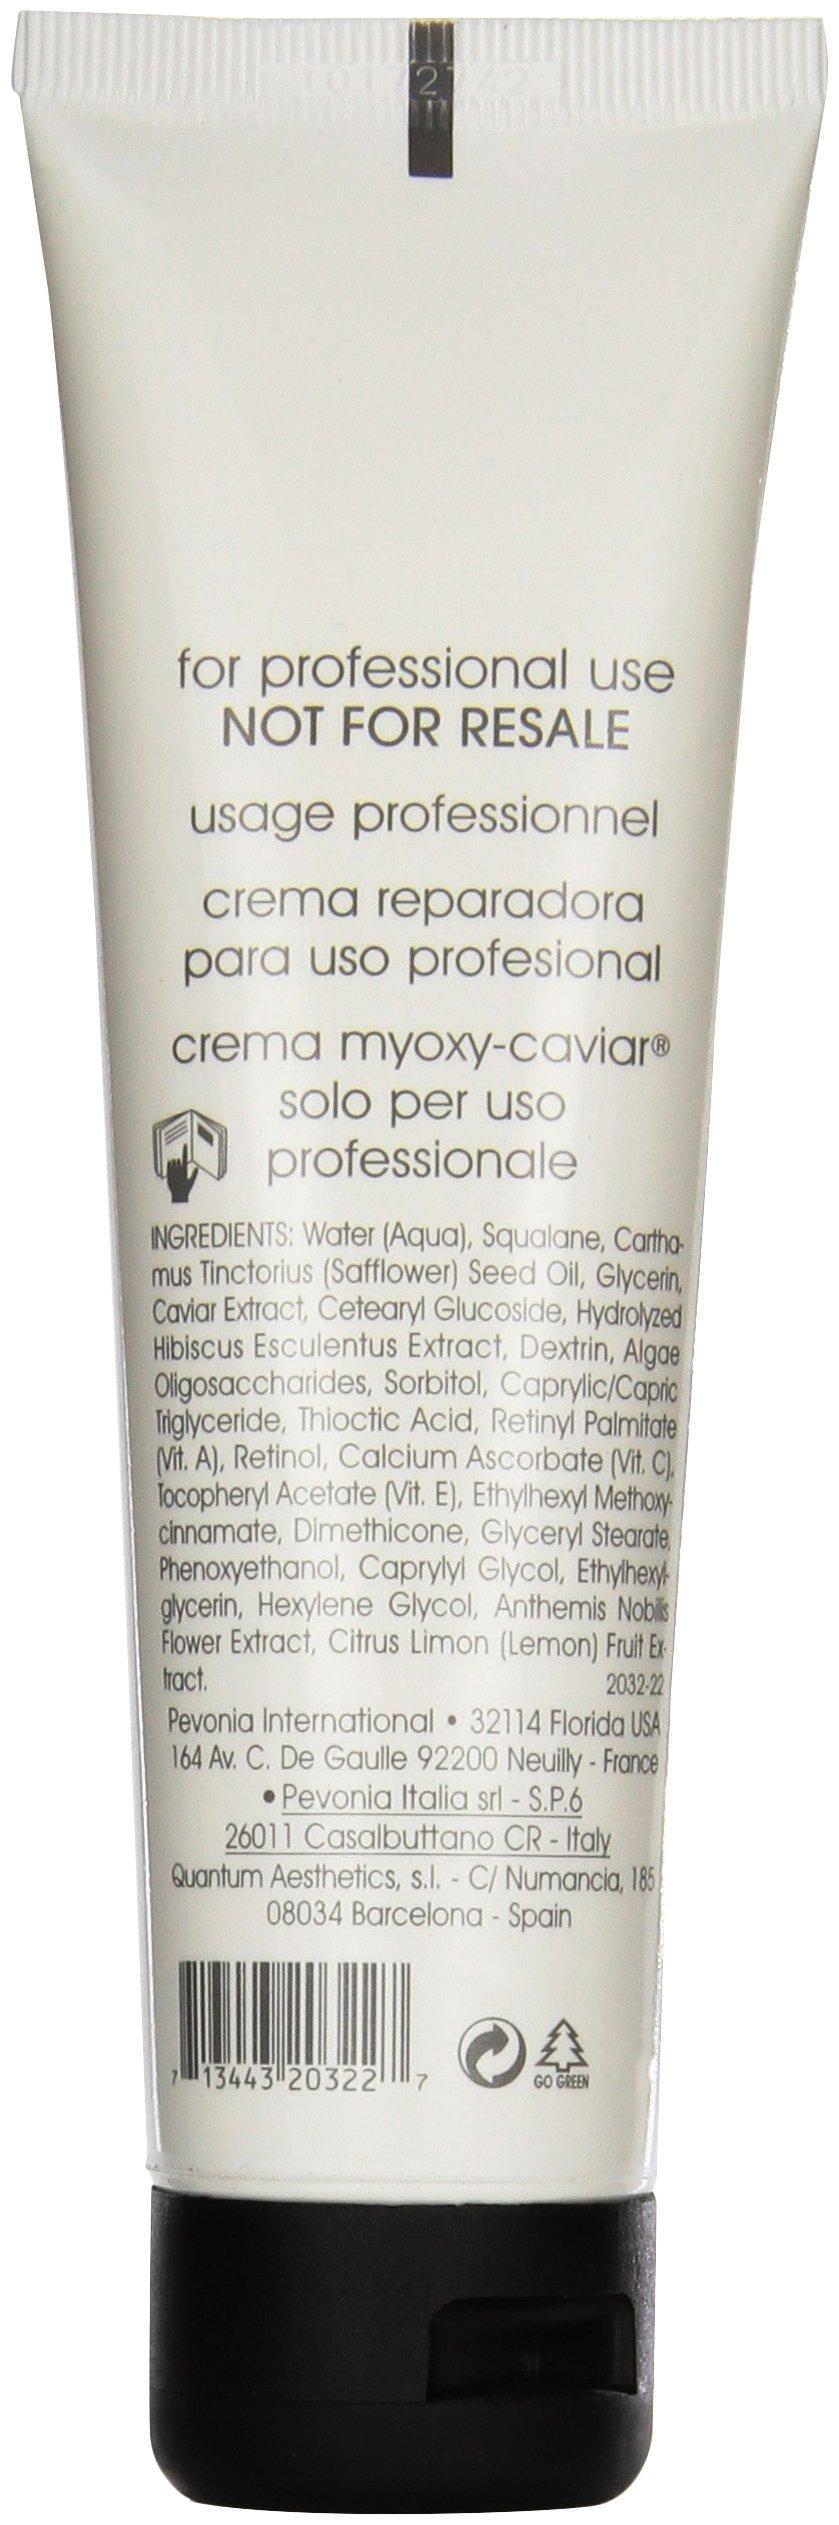 Pevonia Timeless Repair Cream, 3.4 Ounce by Pevonia Botanica (Image #2)